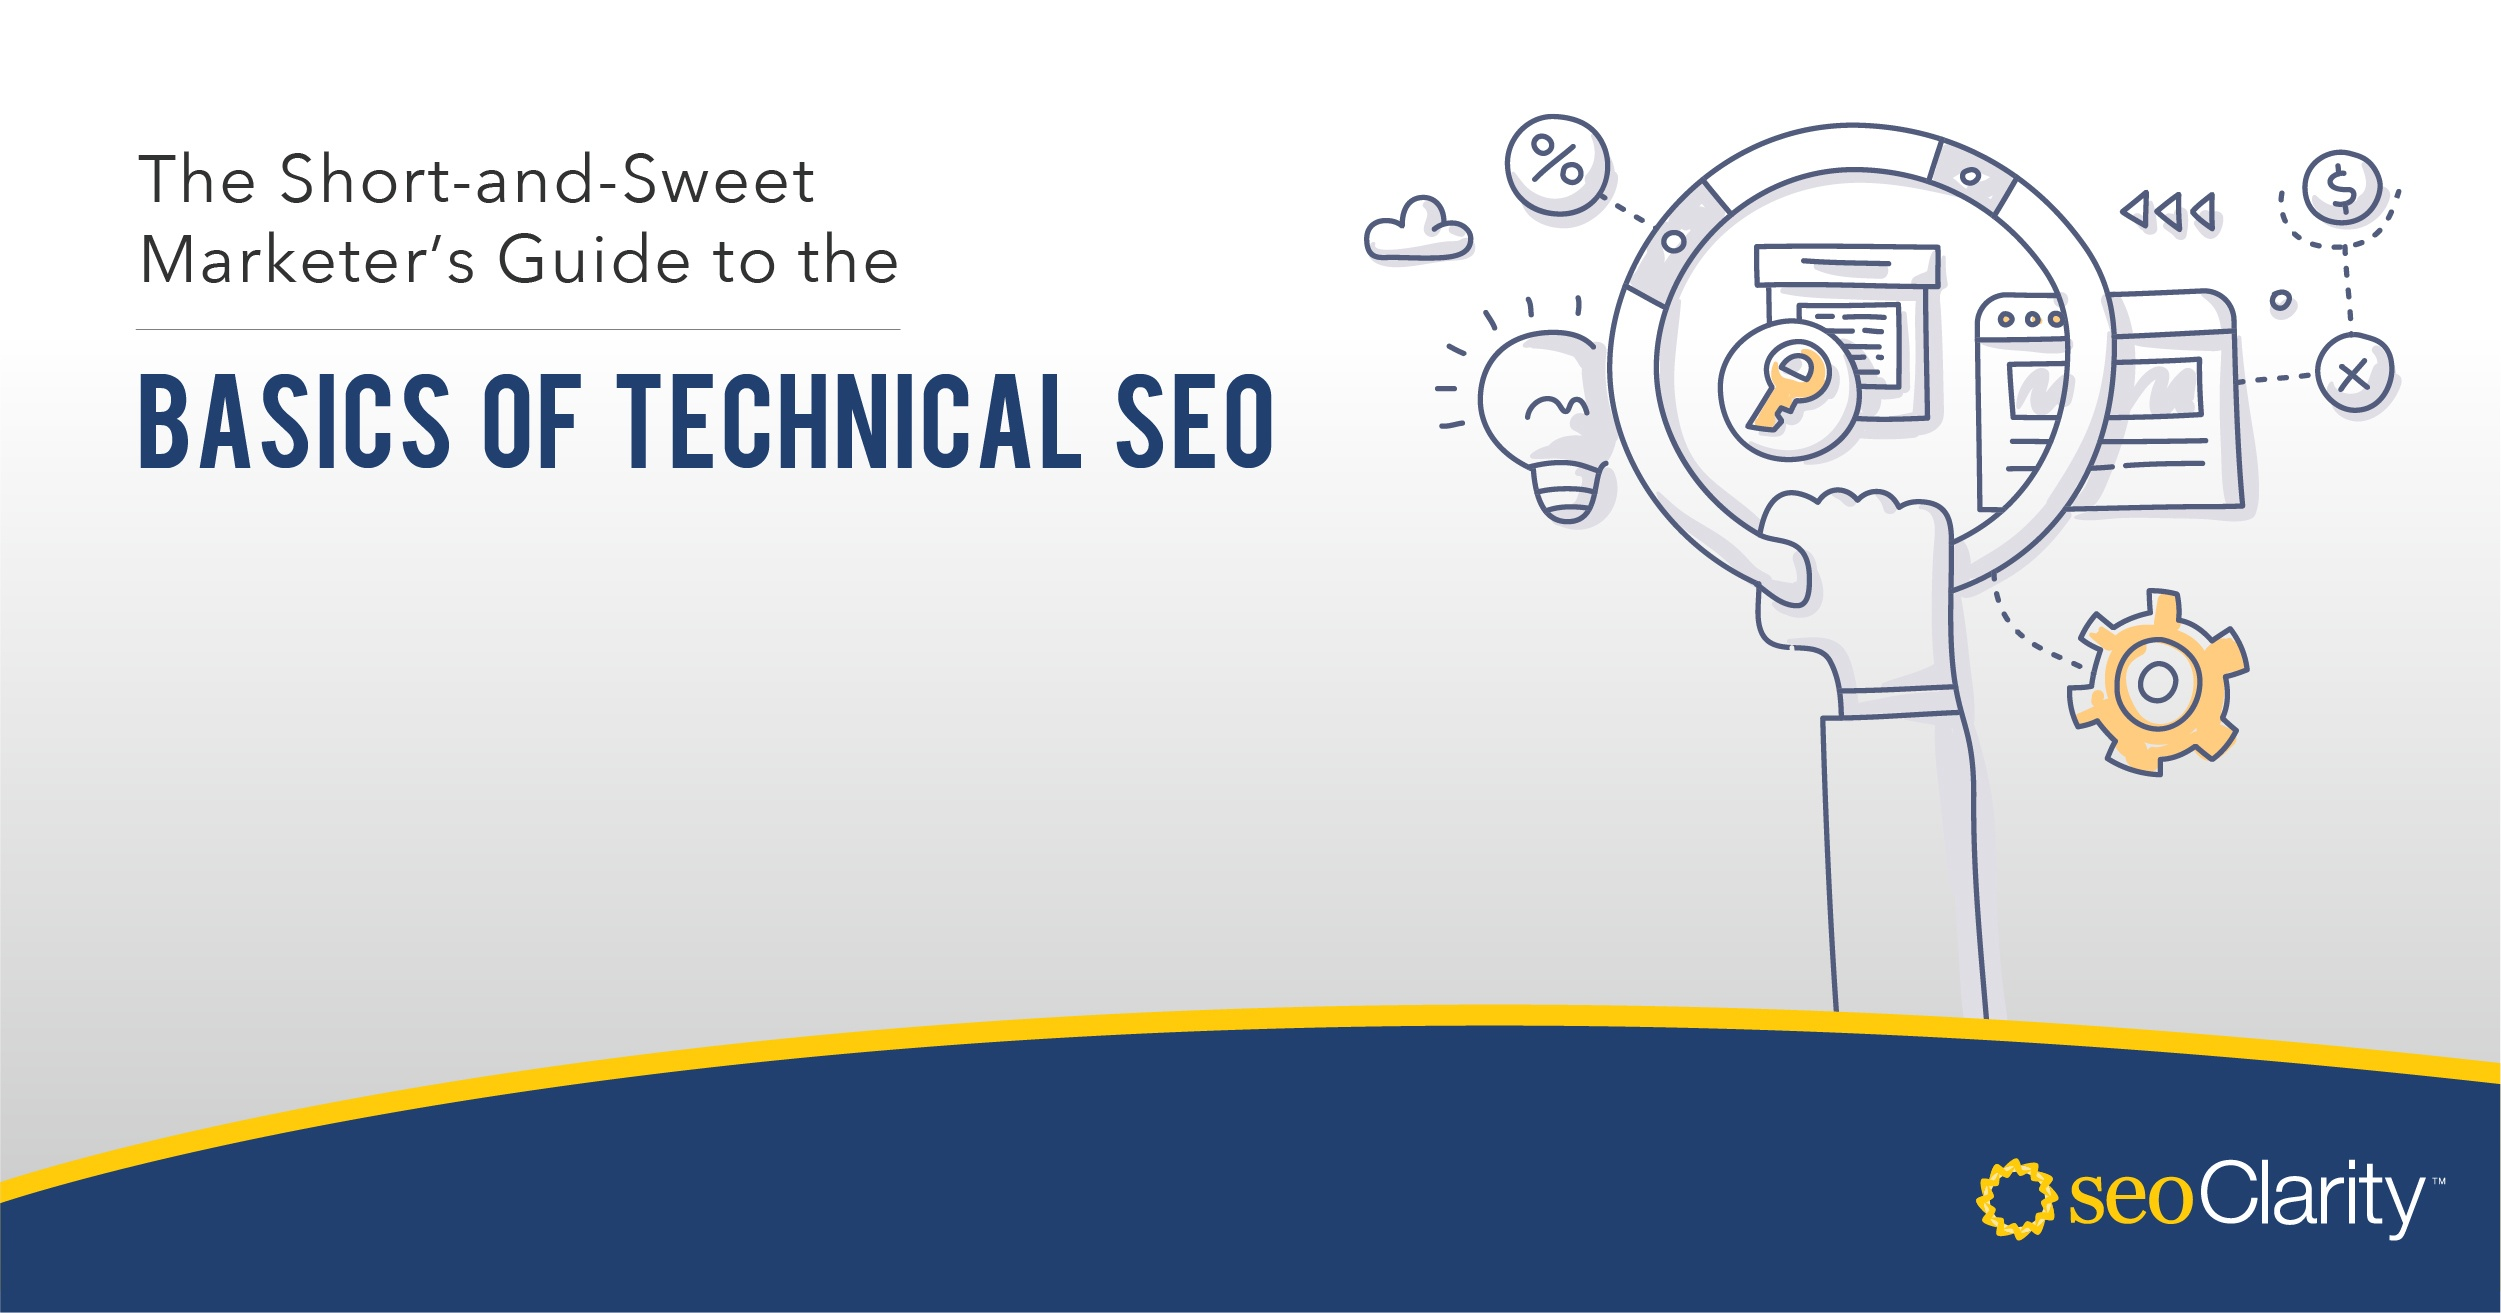 Basics of Technical SEO